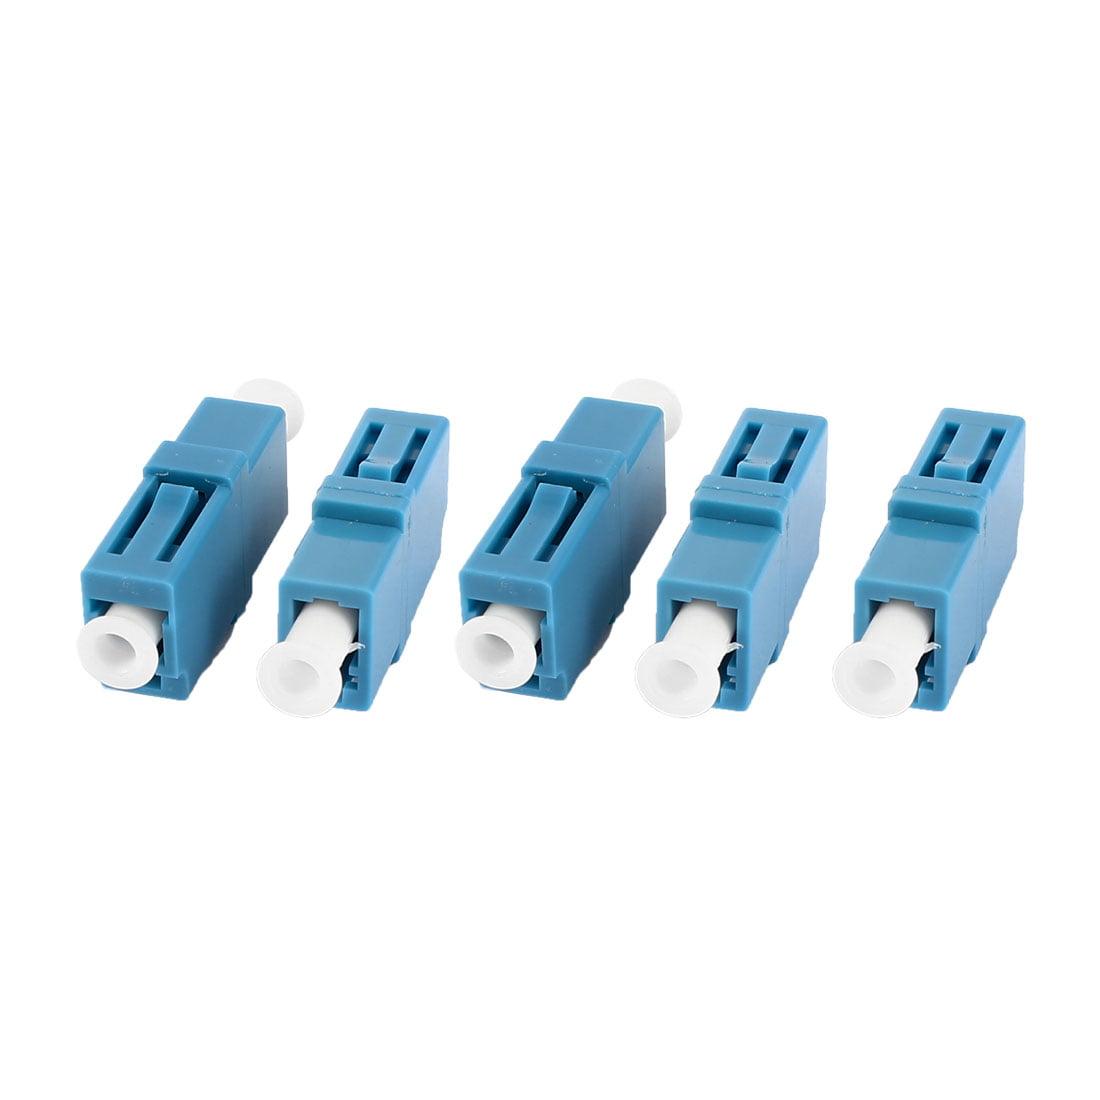 5 Pcs Plastic LC/SX Simplex Flange Fiber Optic Optical Adapter